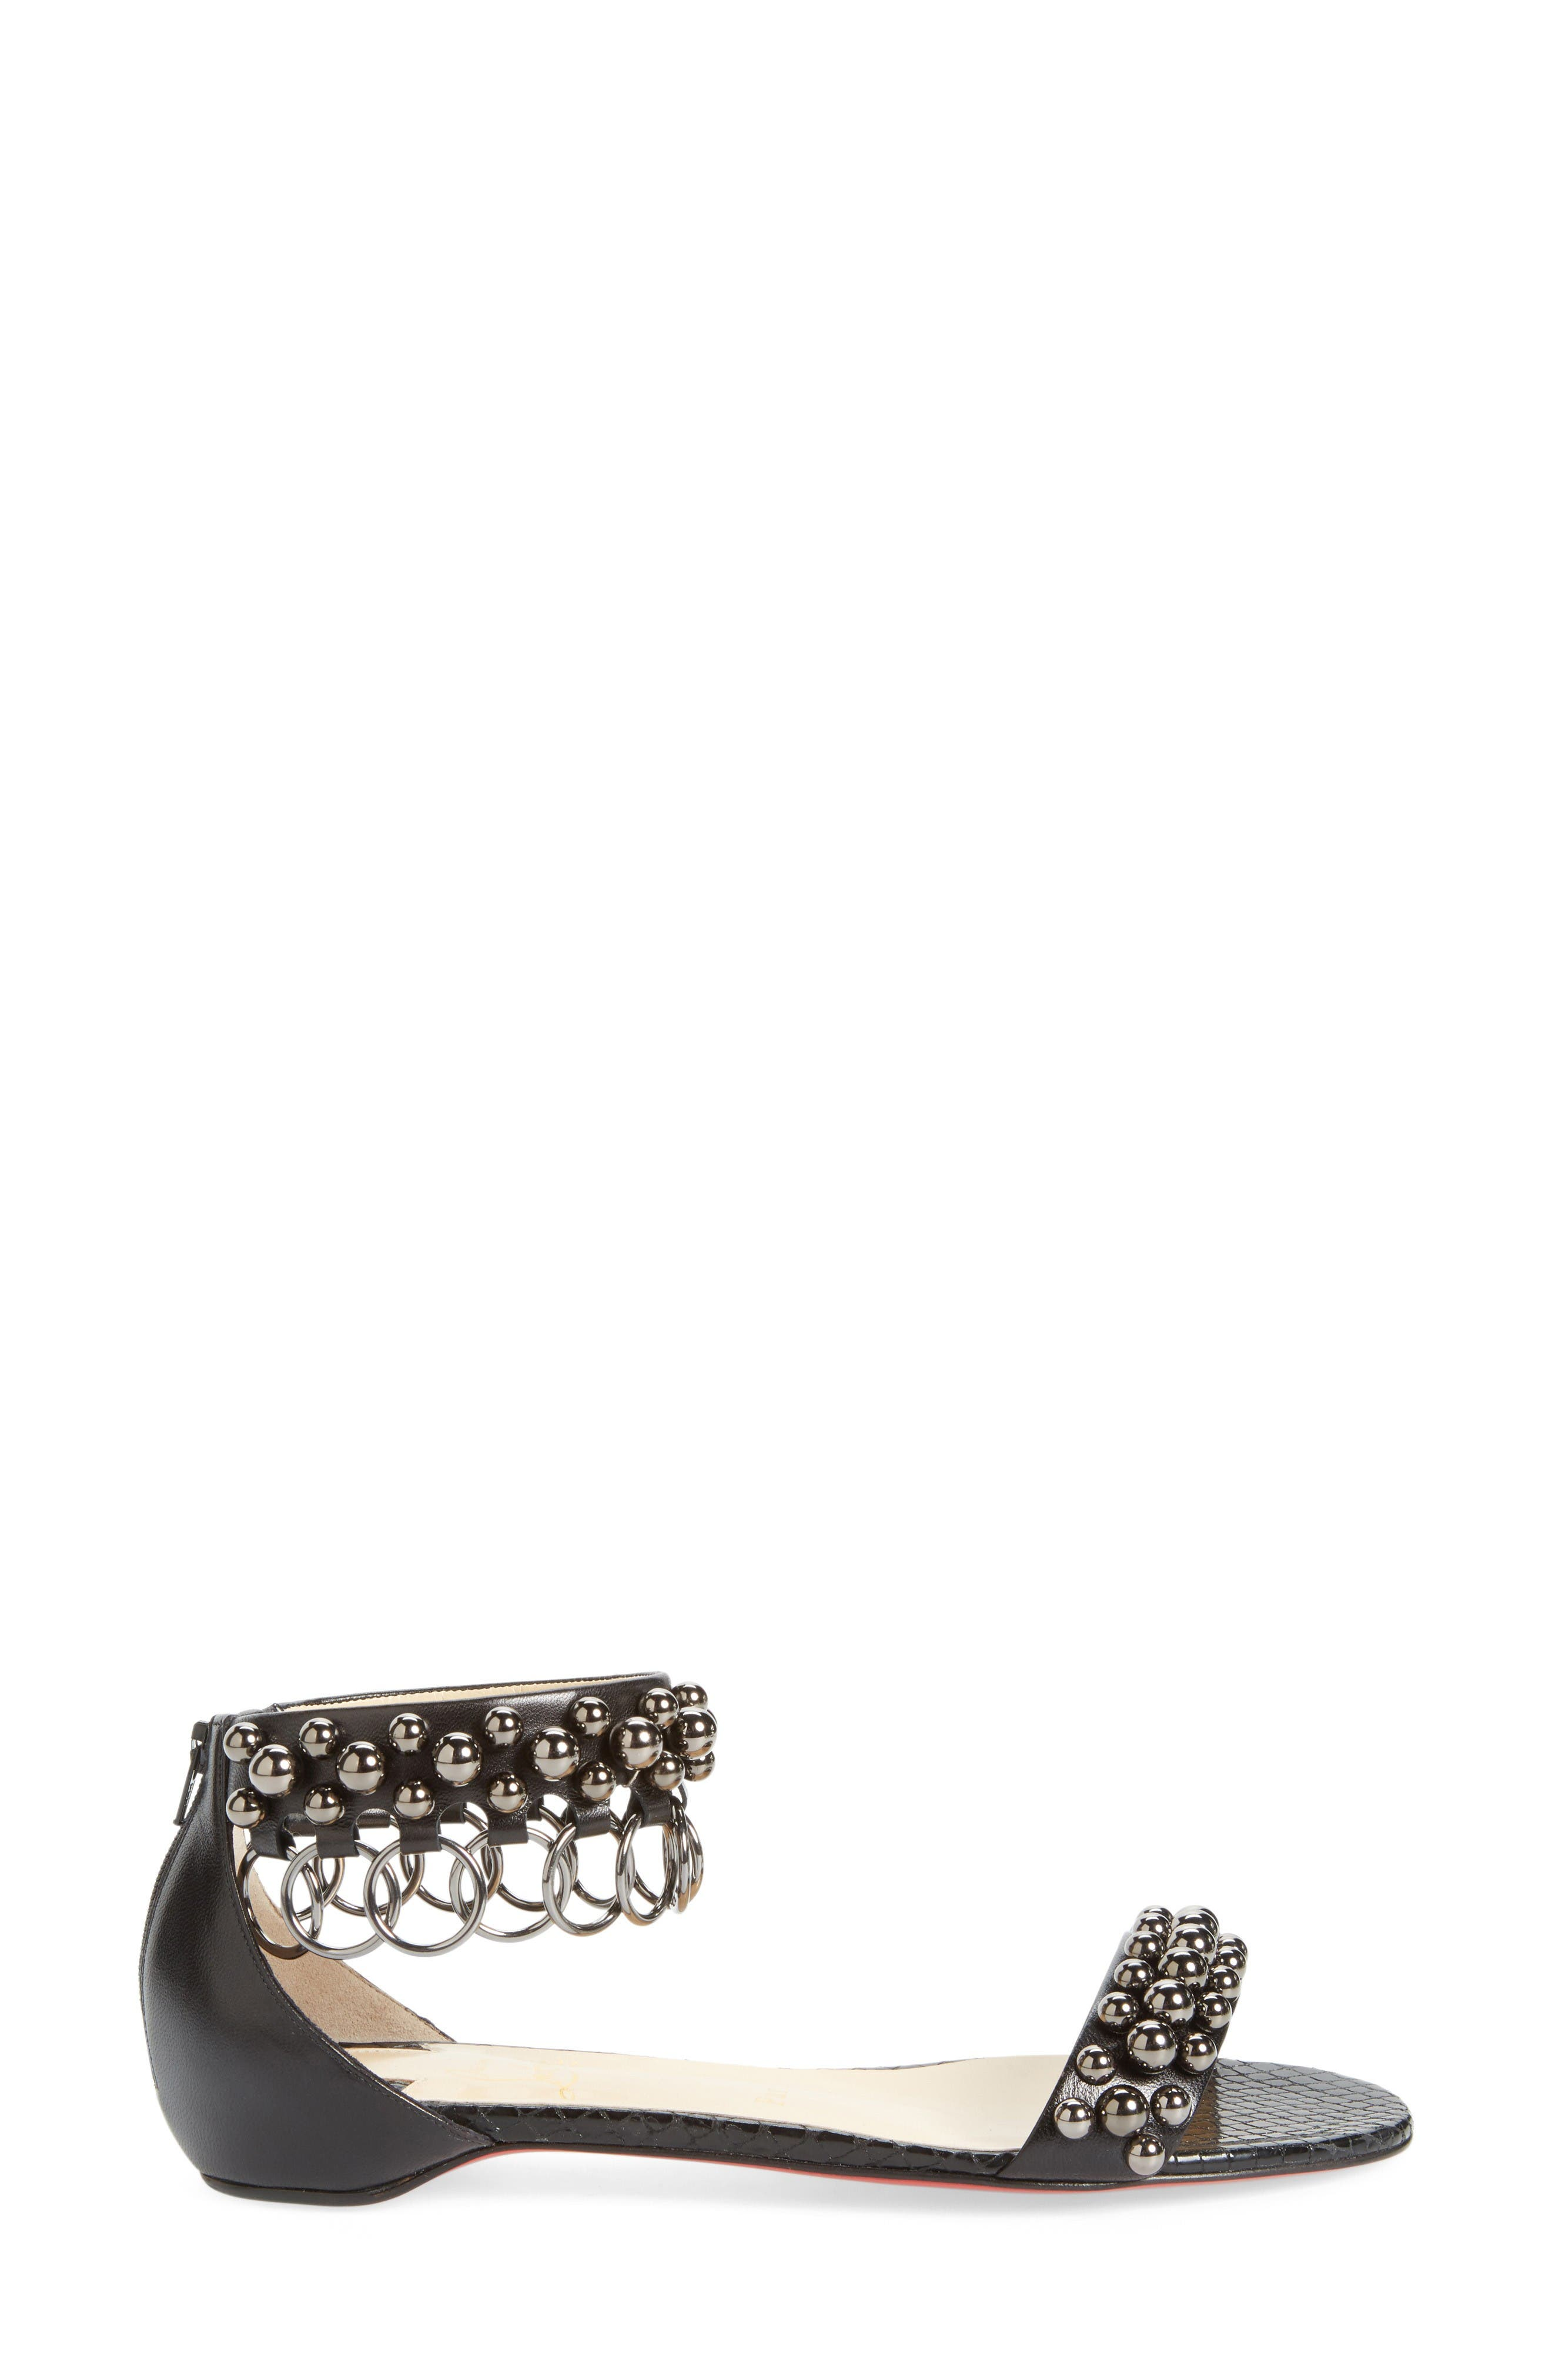 Alternate Image 3  - Christian Louboutin Gypso Ringlet Sandal